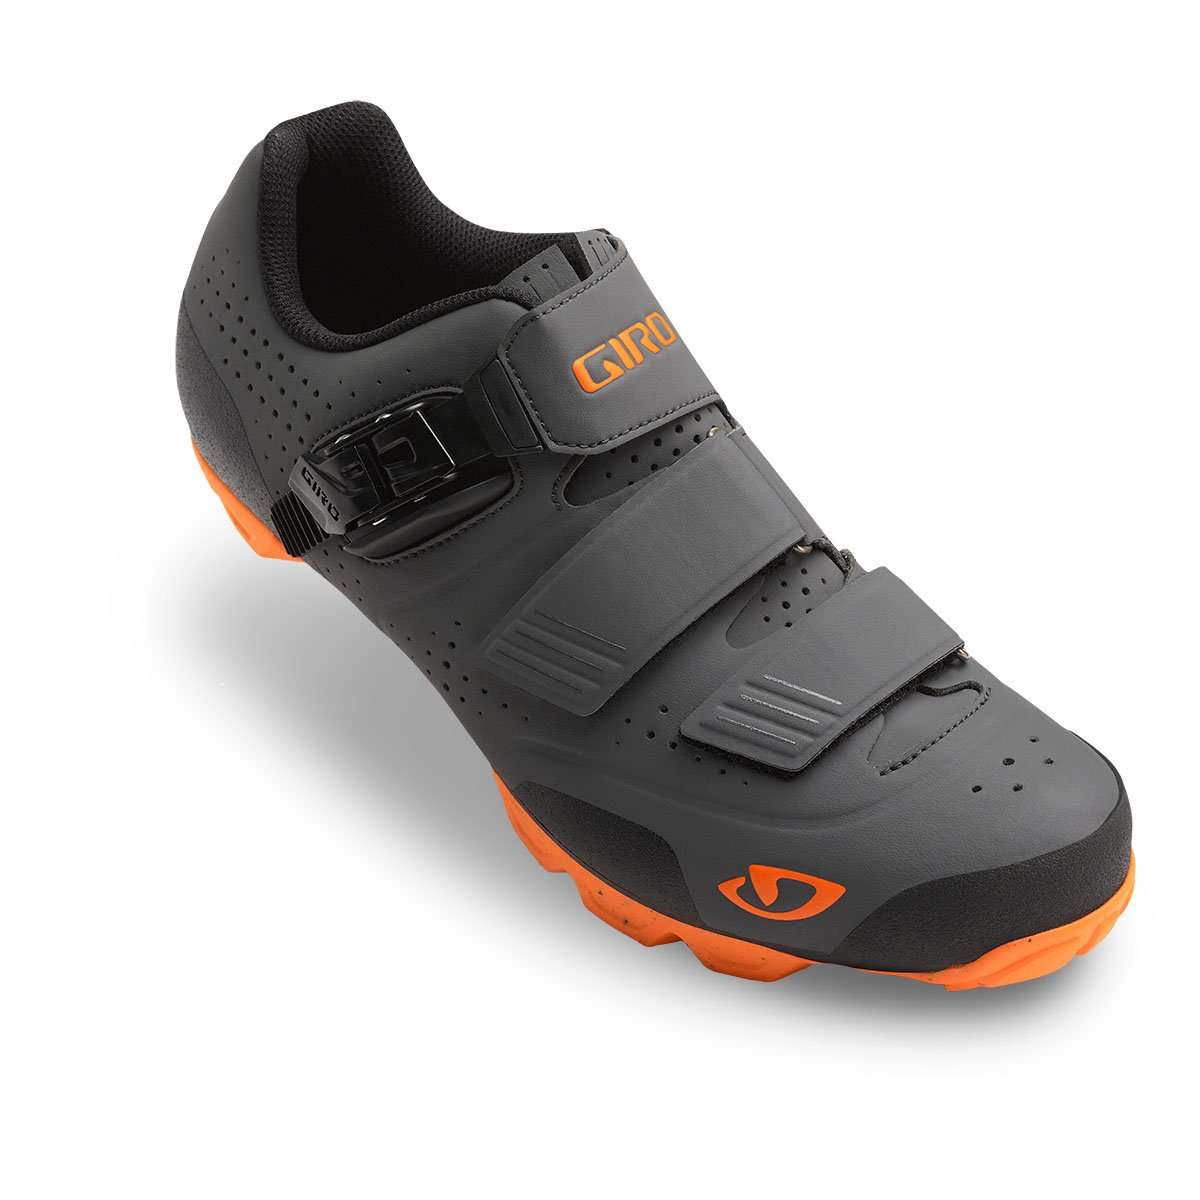 Giro メンズ Privateer R B015T7CYBQ 40.5|Dark Shadow/Flame Dark Shadow/Flame 40.5